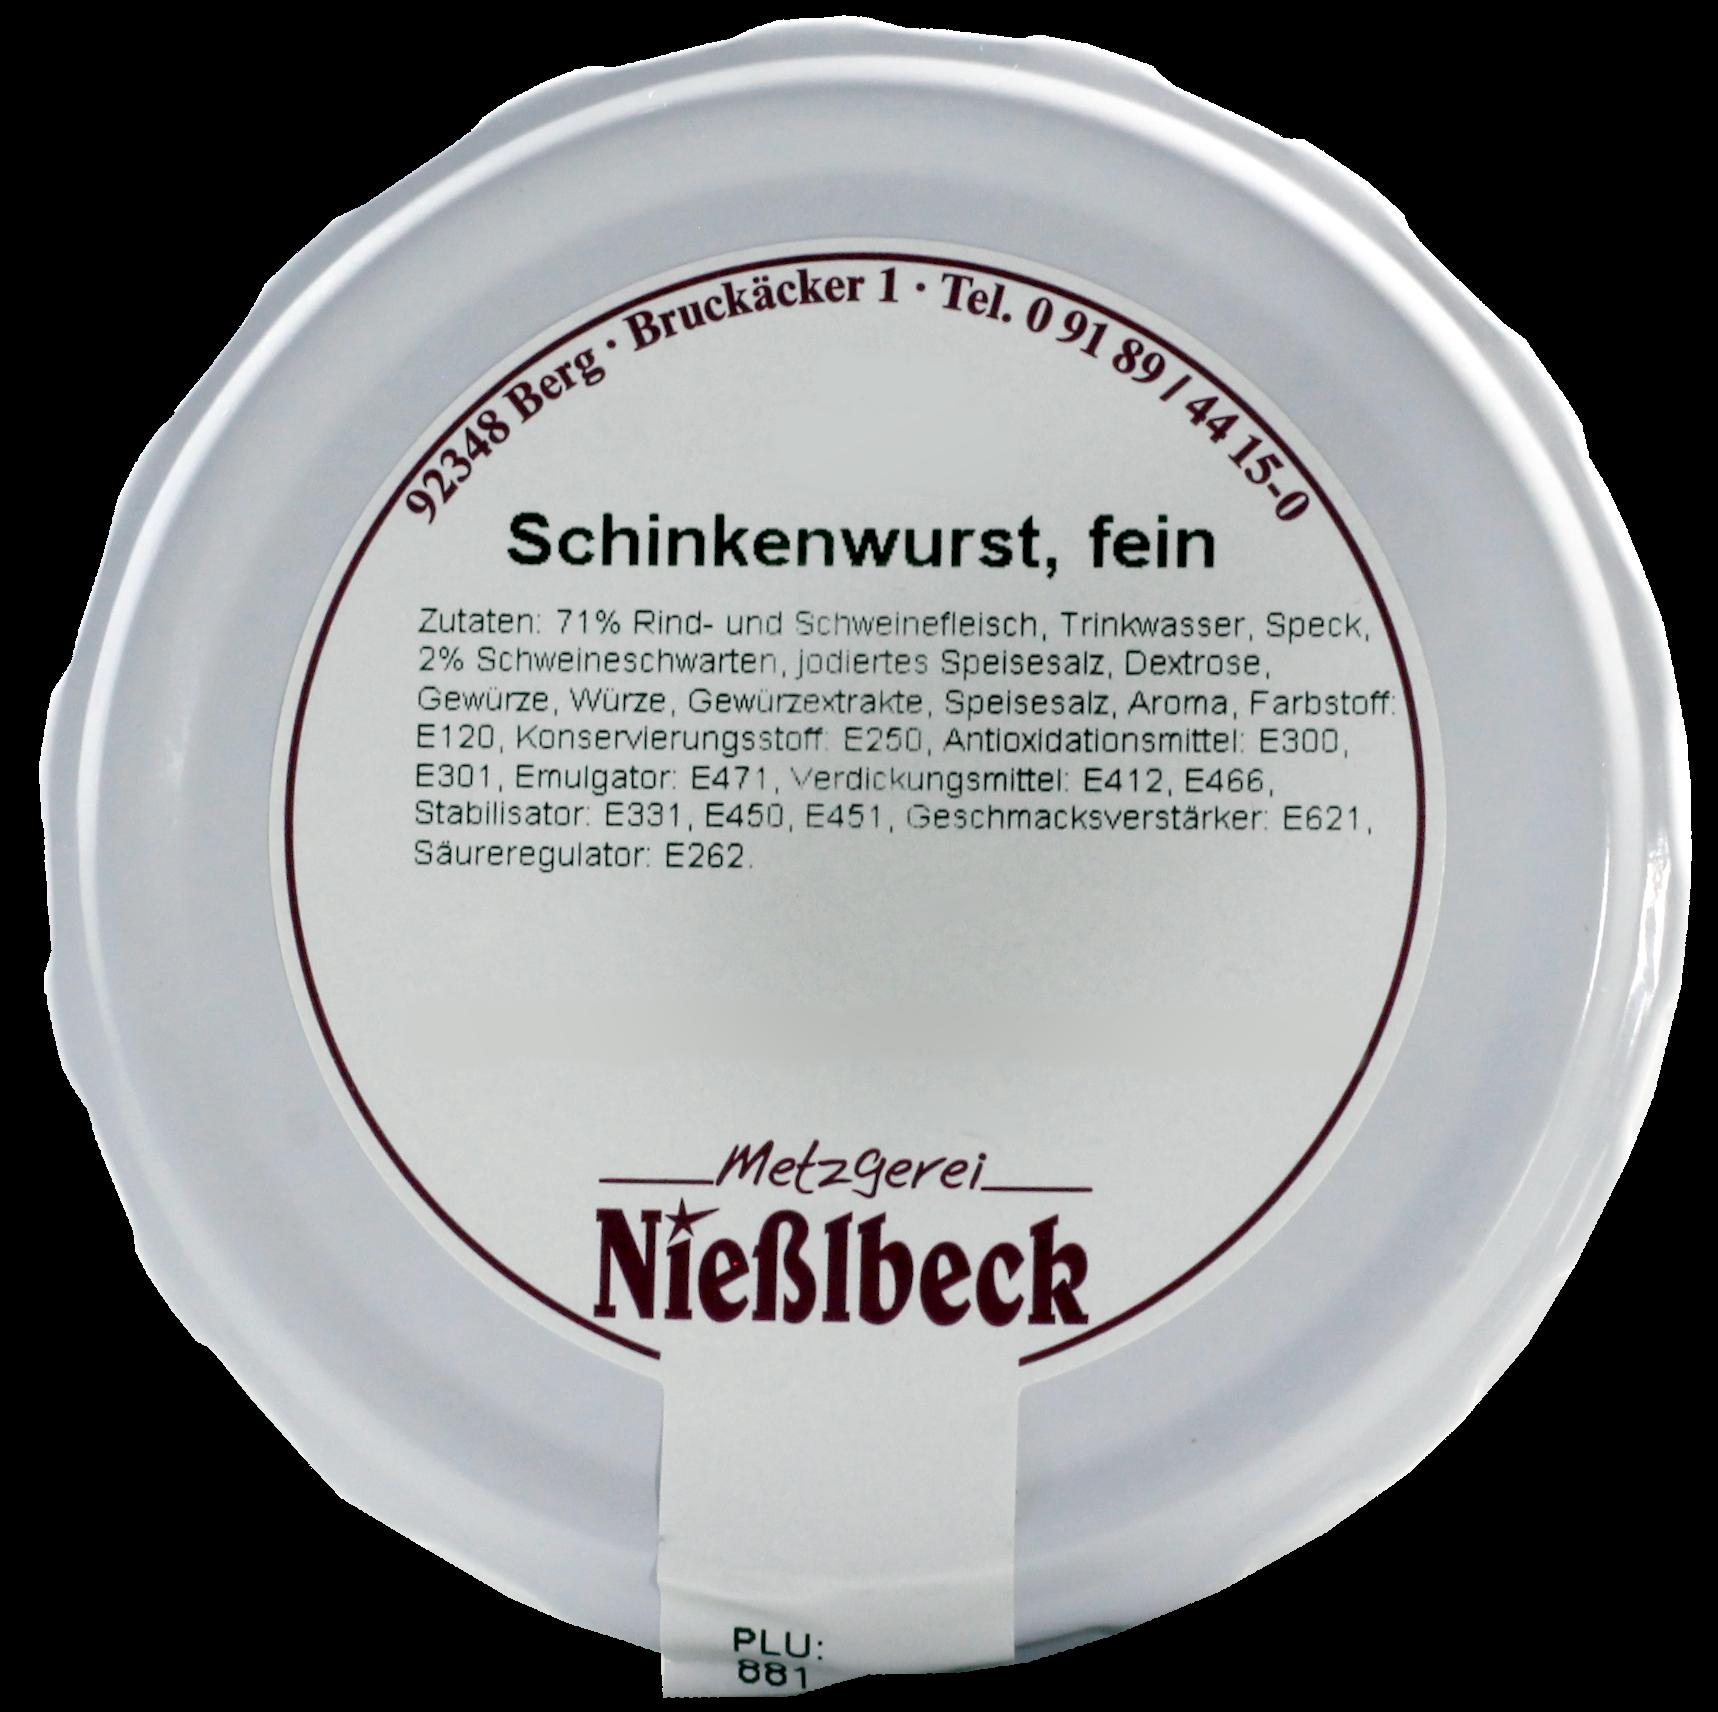 Schinkenwurst, fein (Glas 180g)